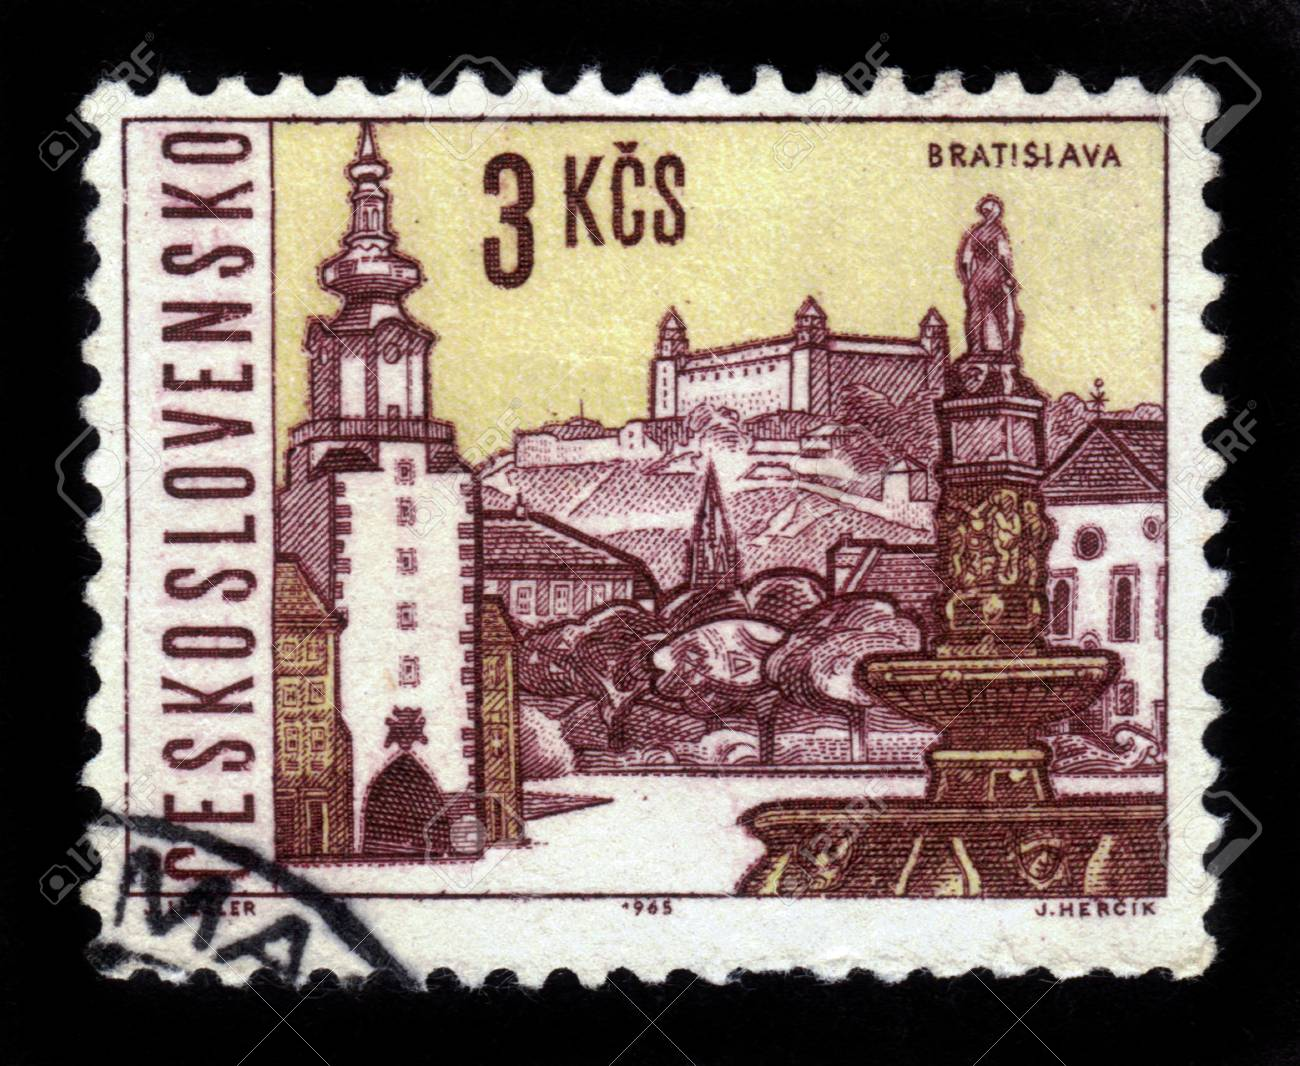 CZECHOSLOVAKIA - CIRCA 1965  A stamp printed in Czechoslovakia shows attractions of Bratislava, the capital of Slovakia, circa 1965 Stock Photo - 19391253